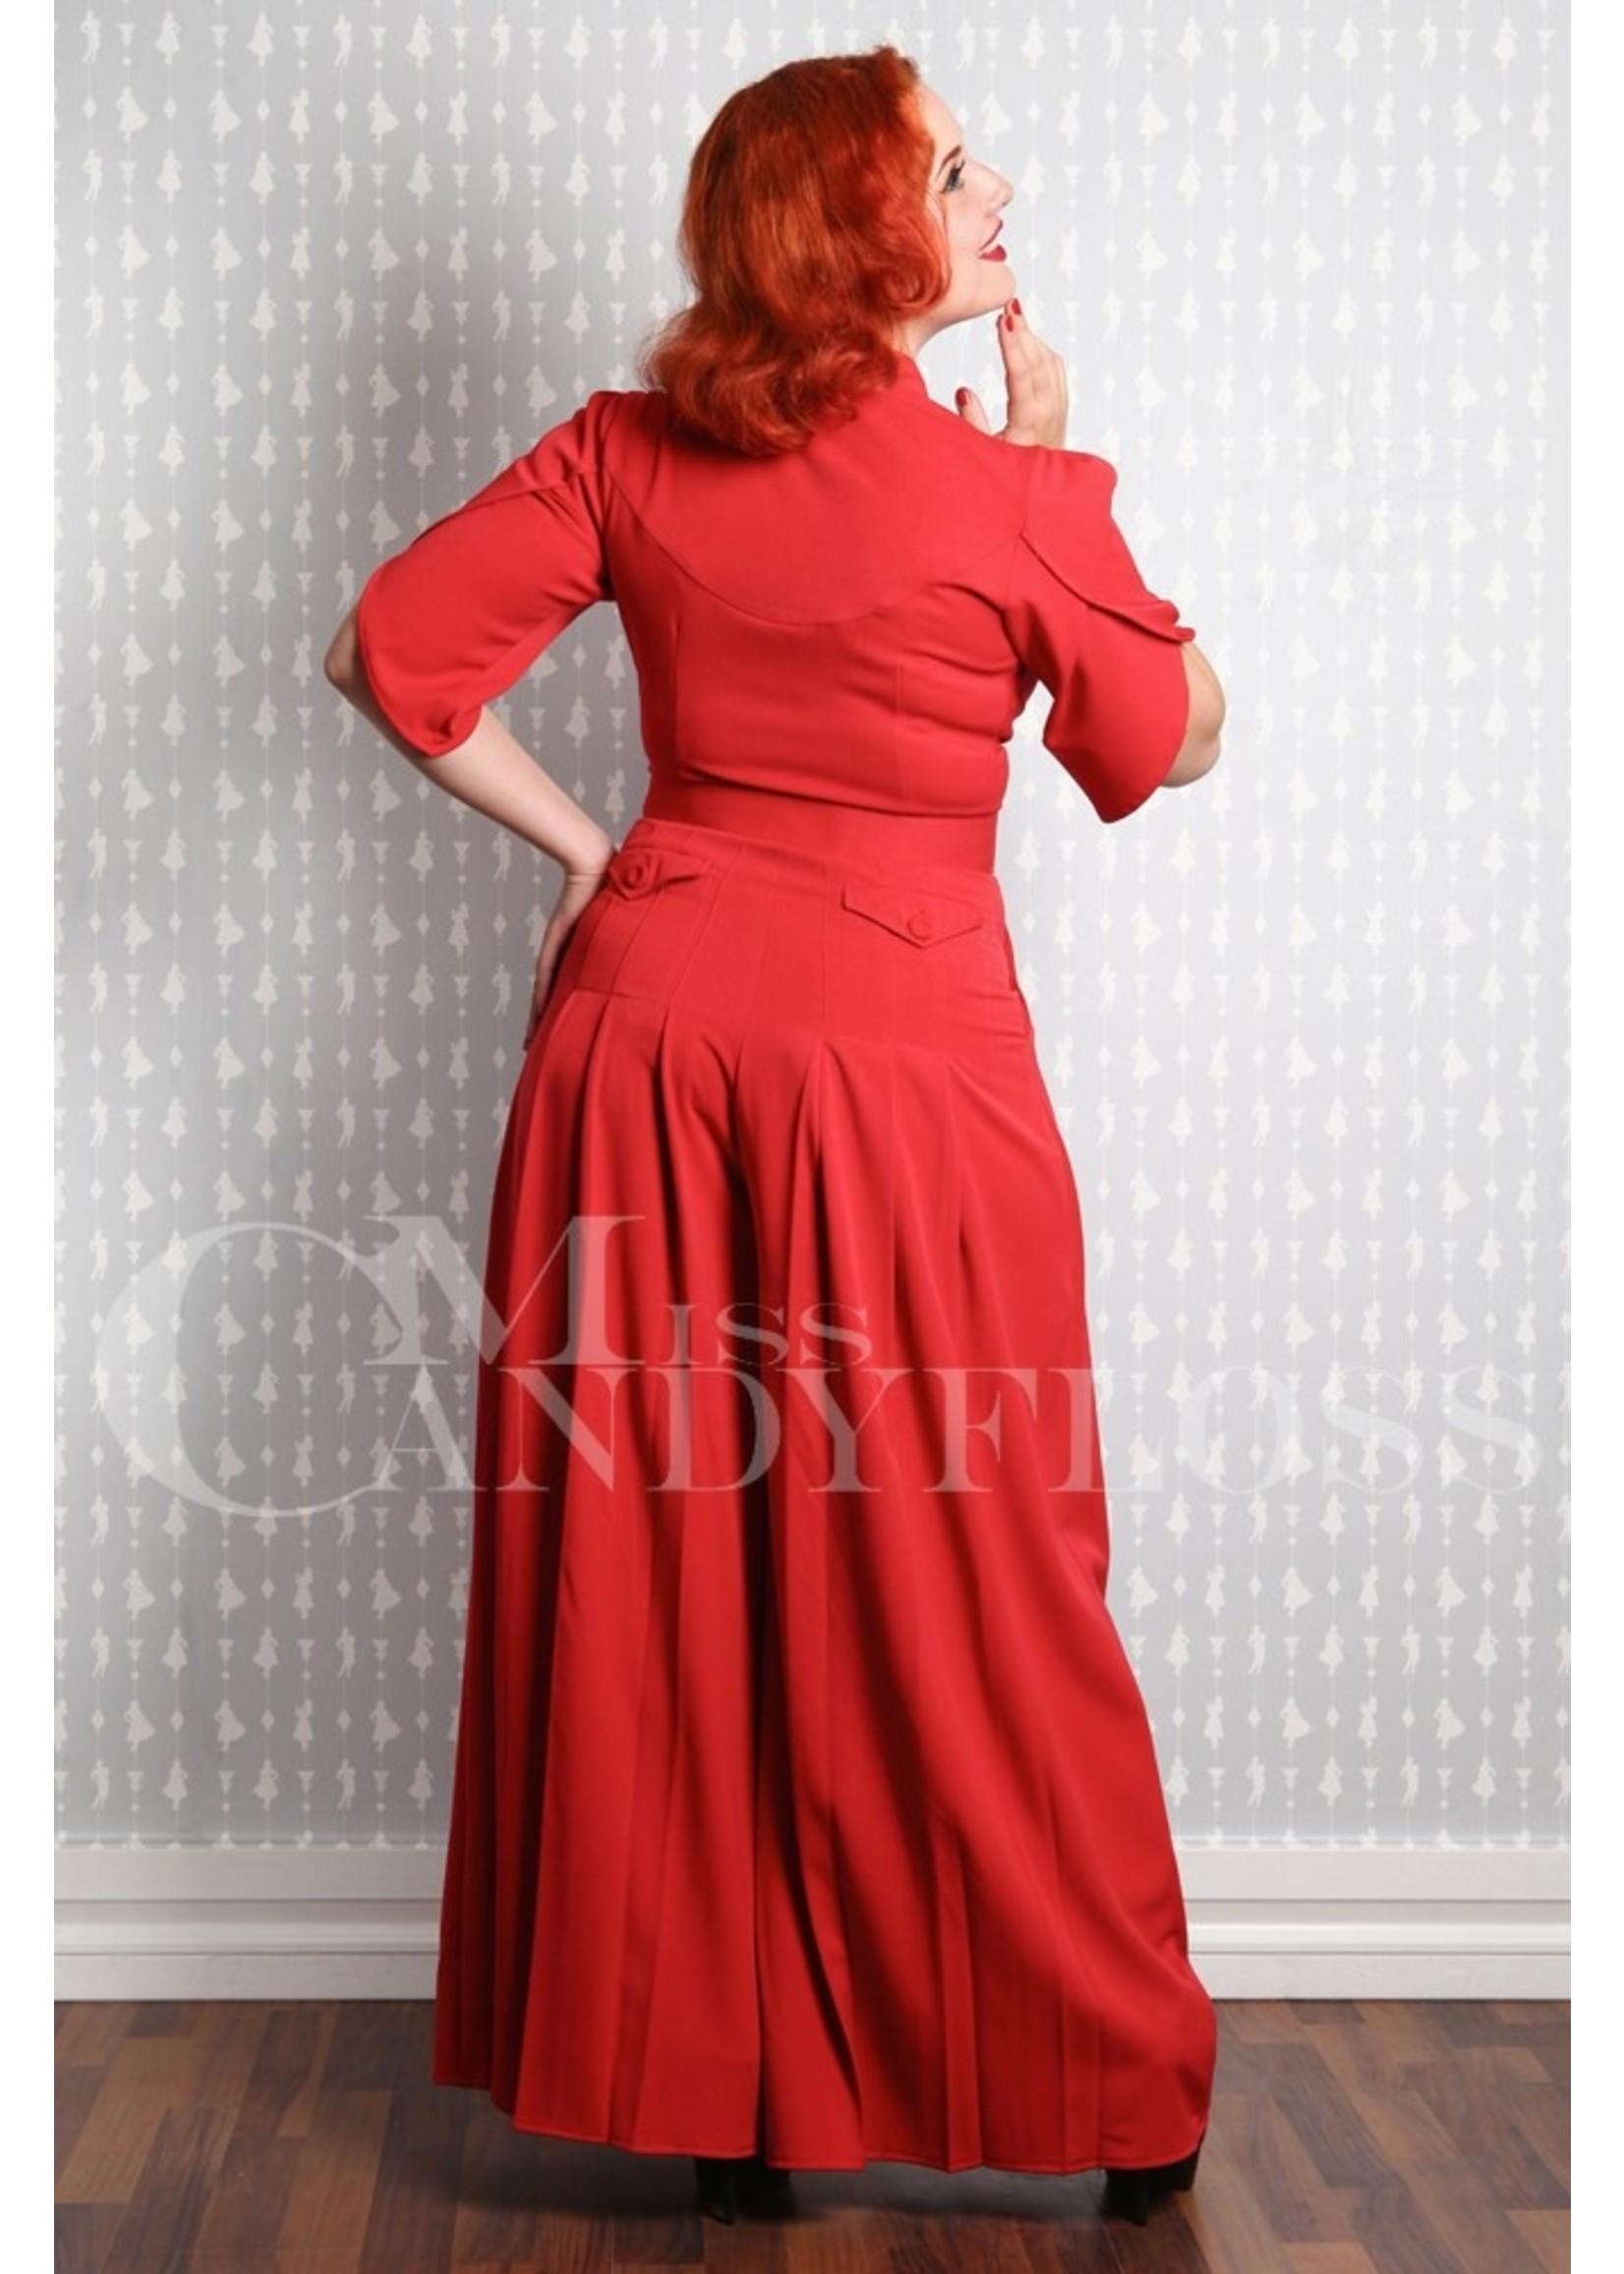 Miss-Candyfloss Miss Candyfloss Gigi-Lou Pantskirt Jumpsuit in Rose